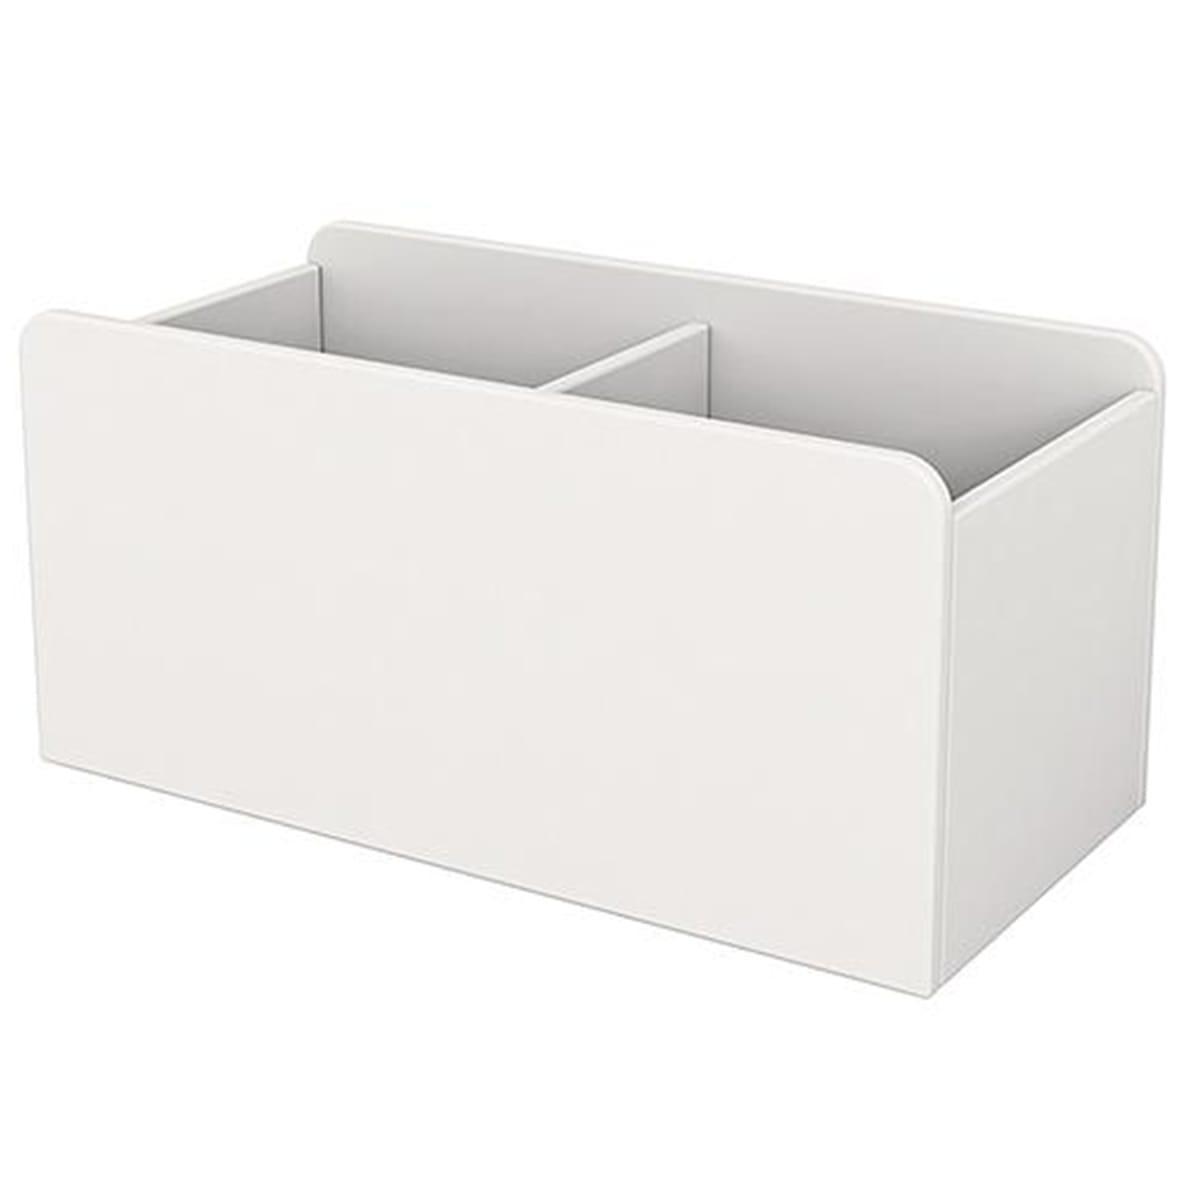 Contenedor almacenamiento SHELFIE Flexa blanco